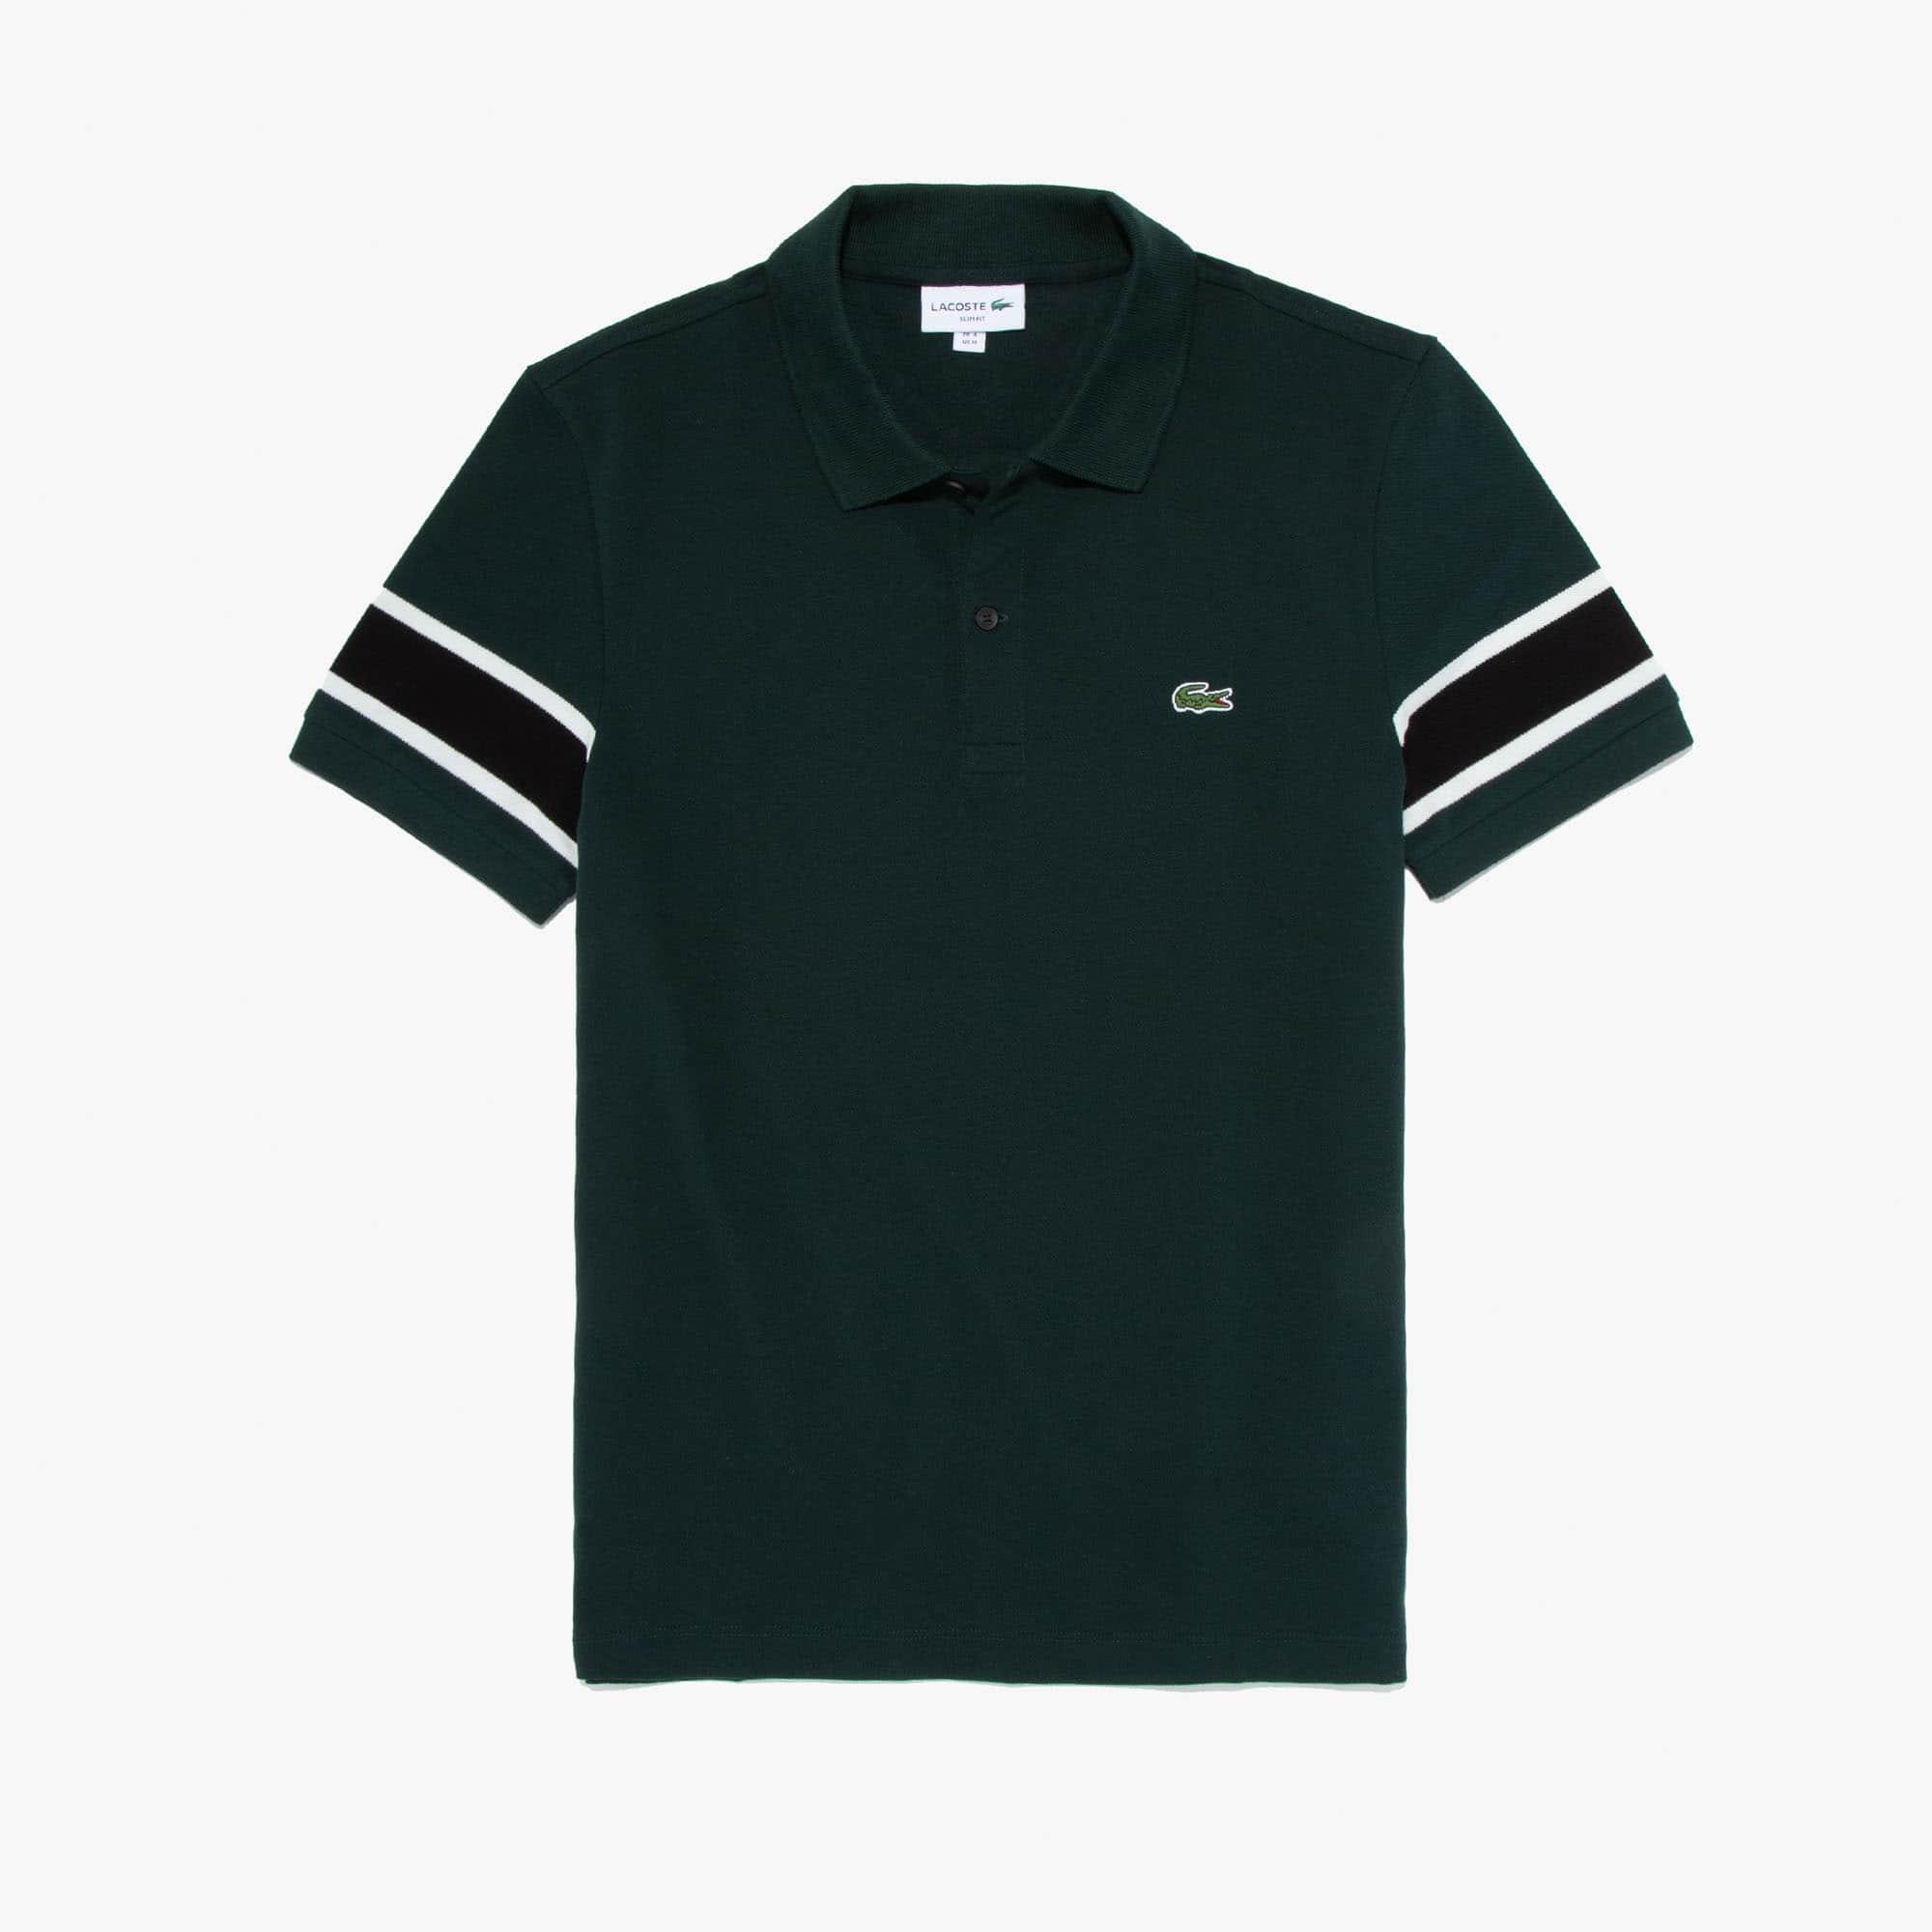 Lacoste Tops Men's Slim Fit Striped-Sleeve Stretch Cotton Piqué Polo Shirt